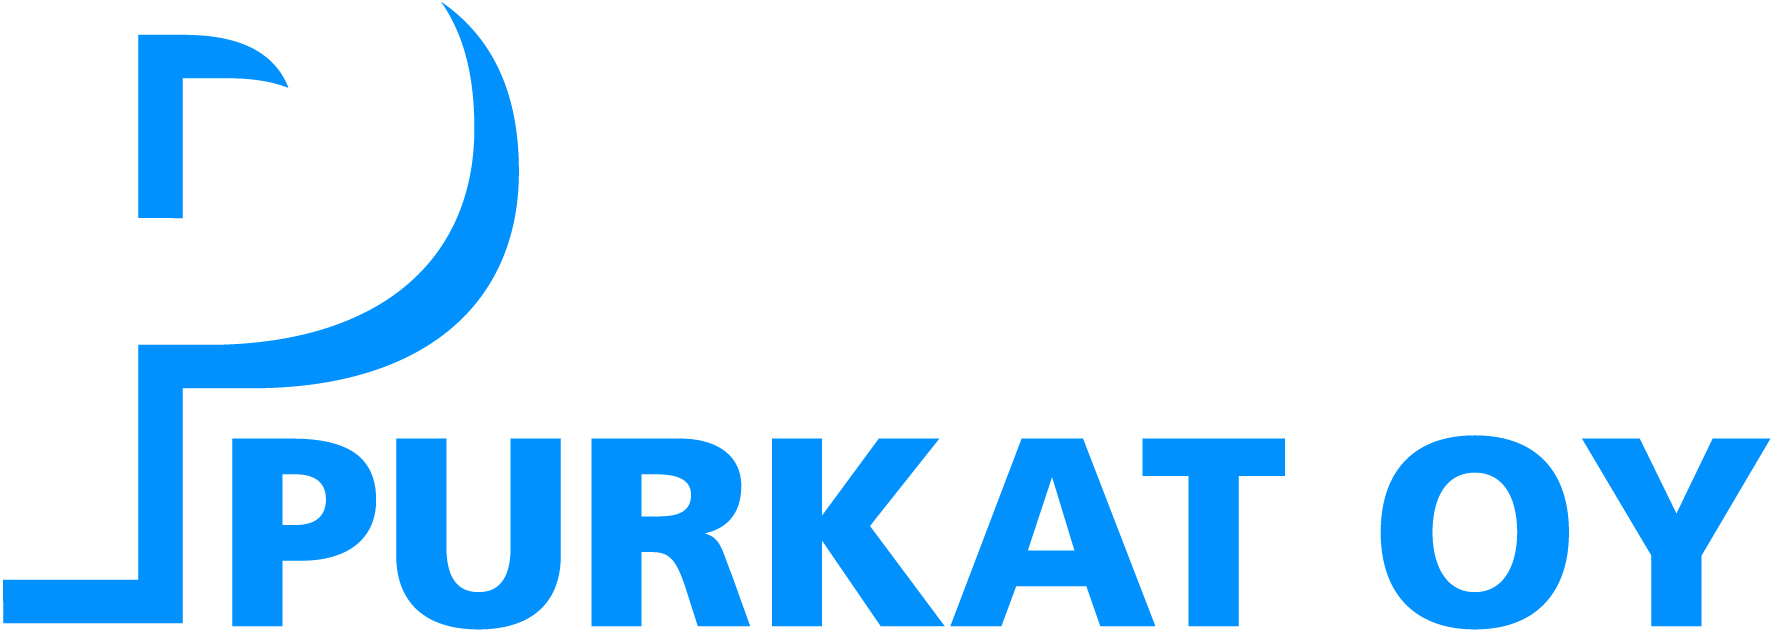 Purkat Oy logo